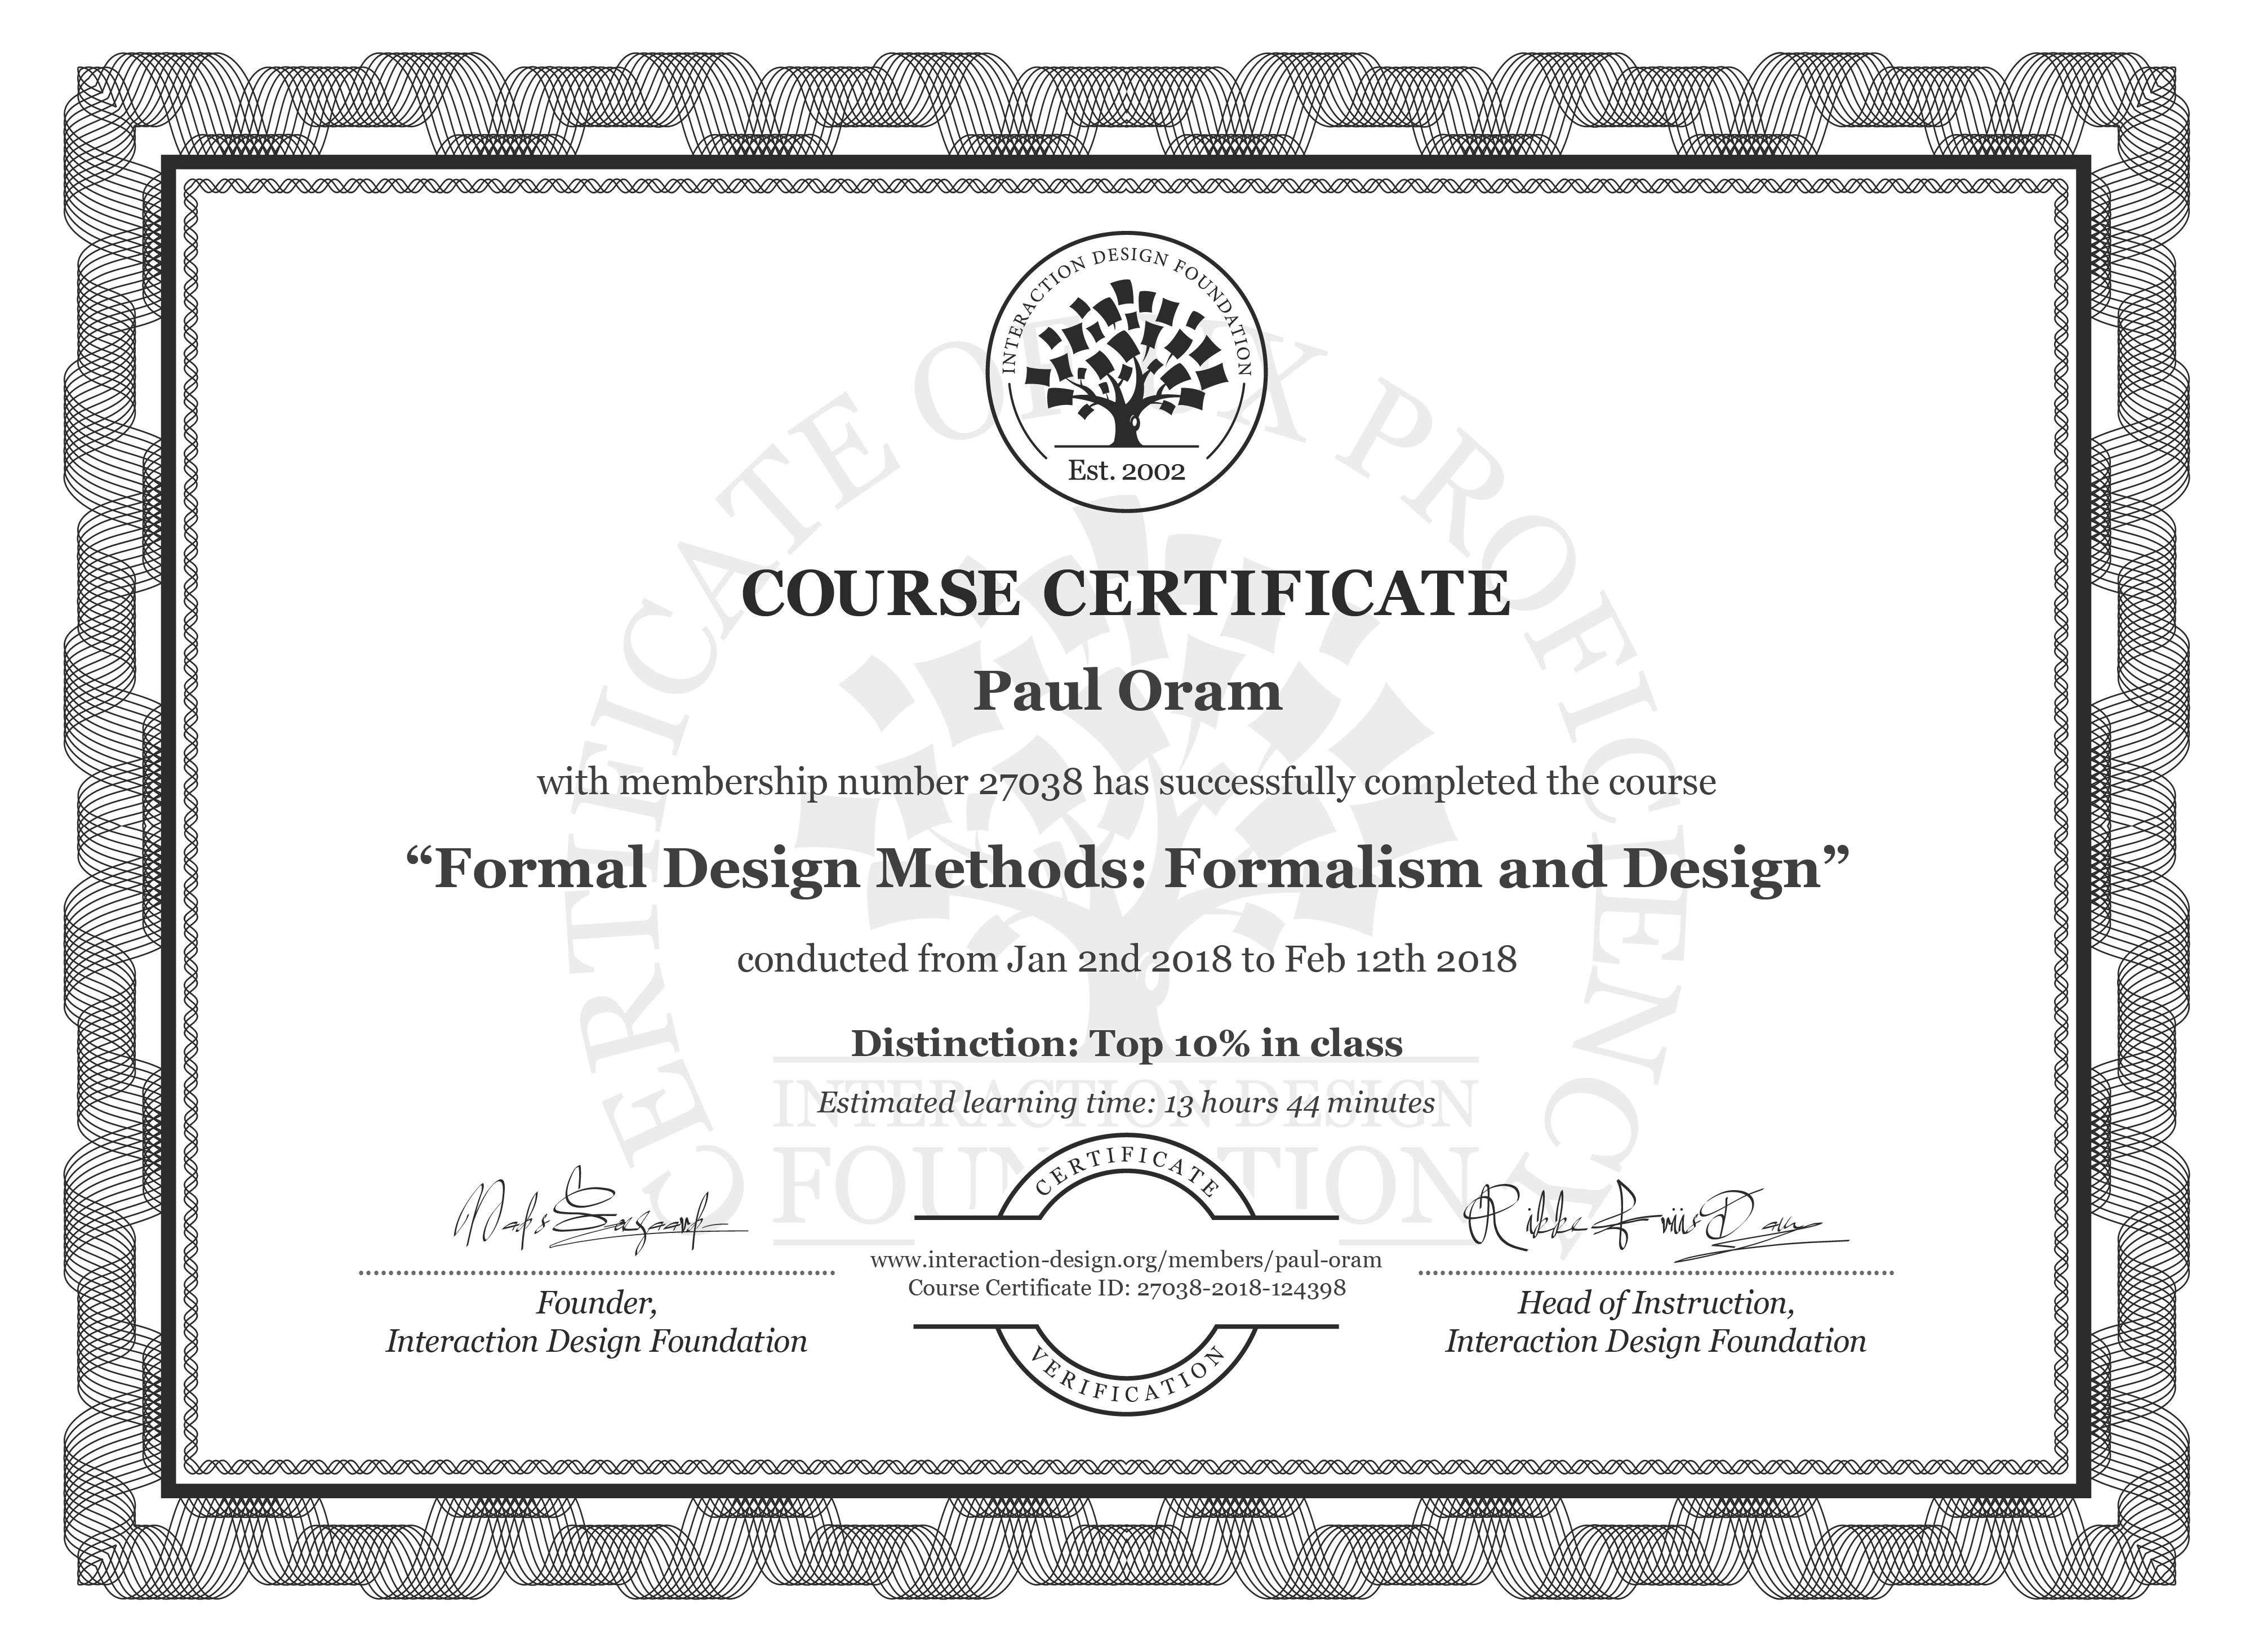 Paul Oram: Course Certificate - Formal Design Methods: Formalism and Design